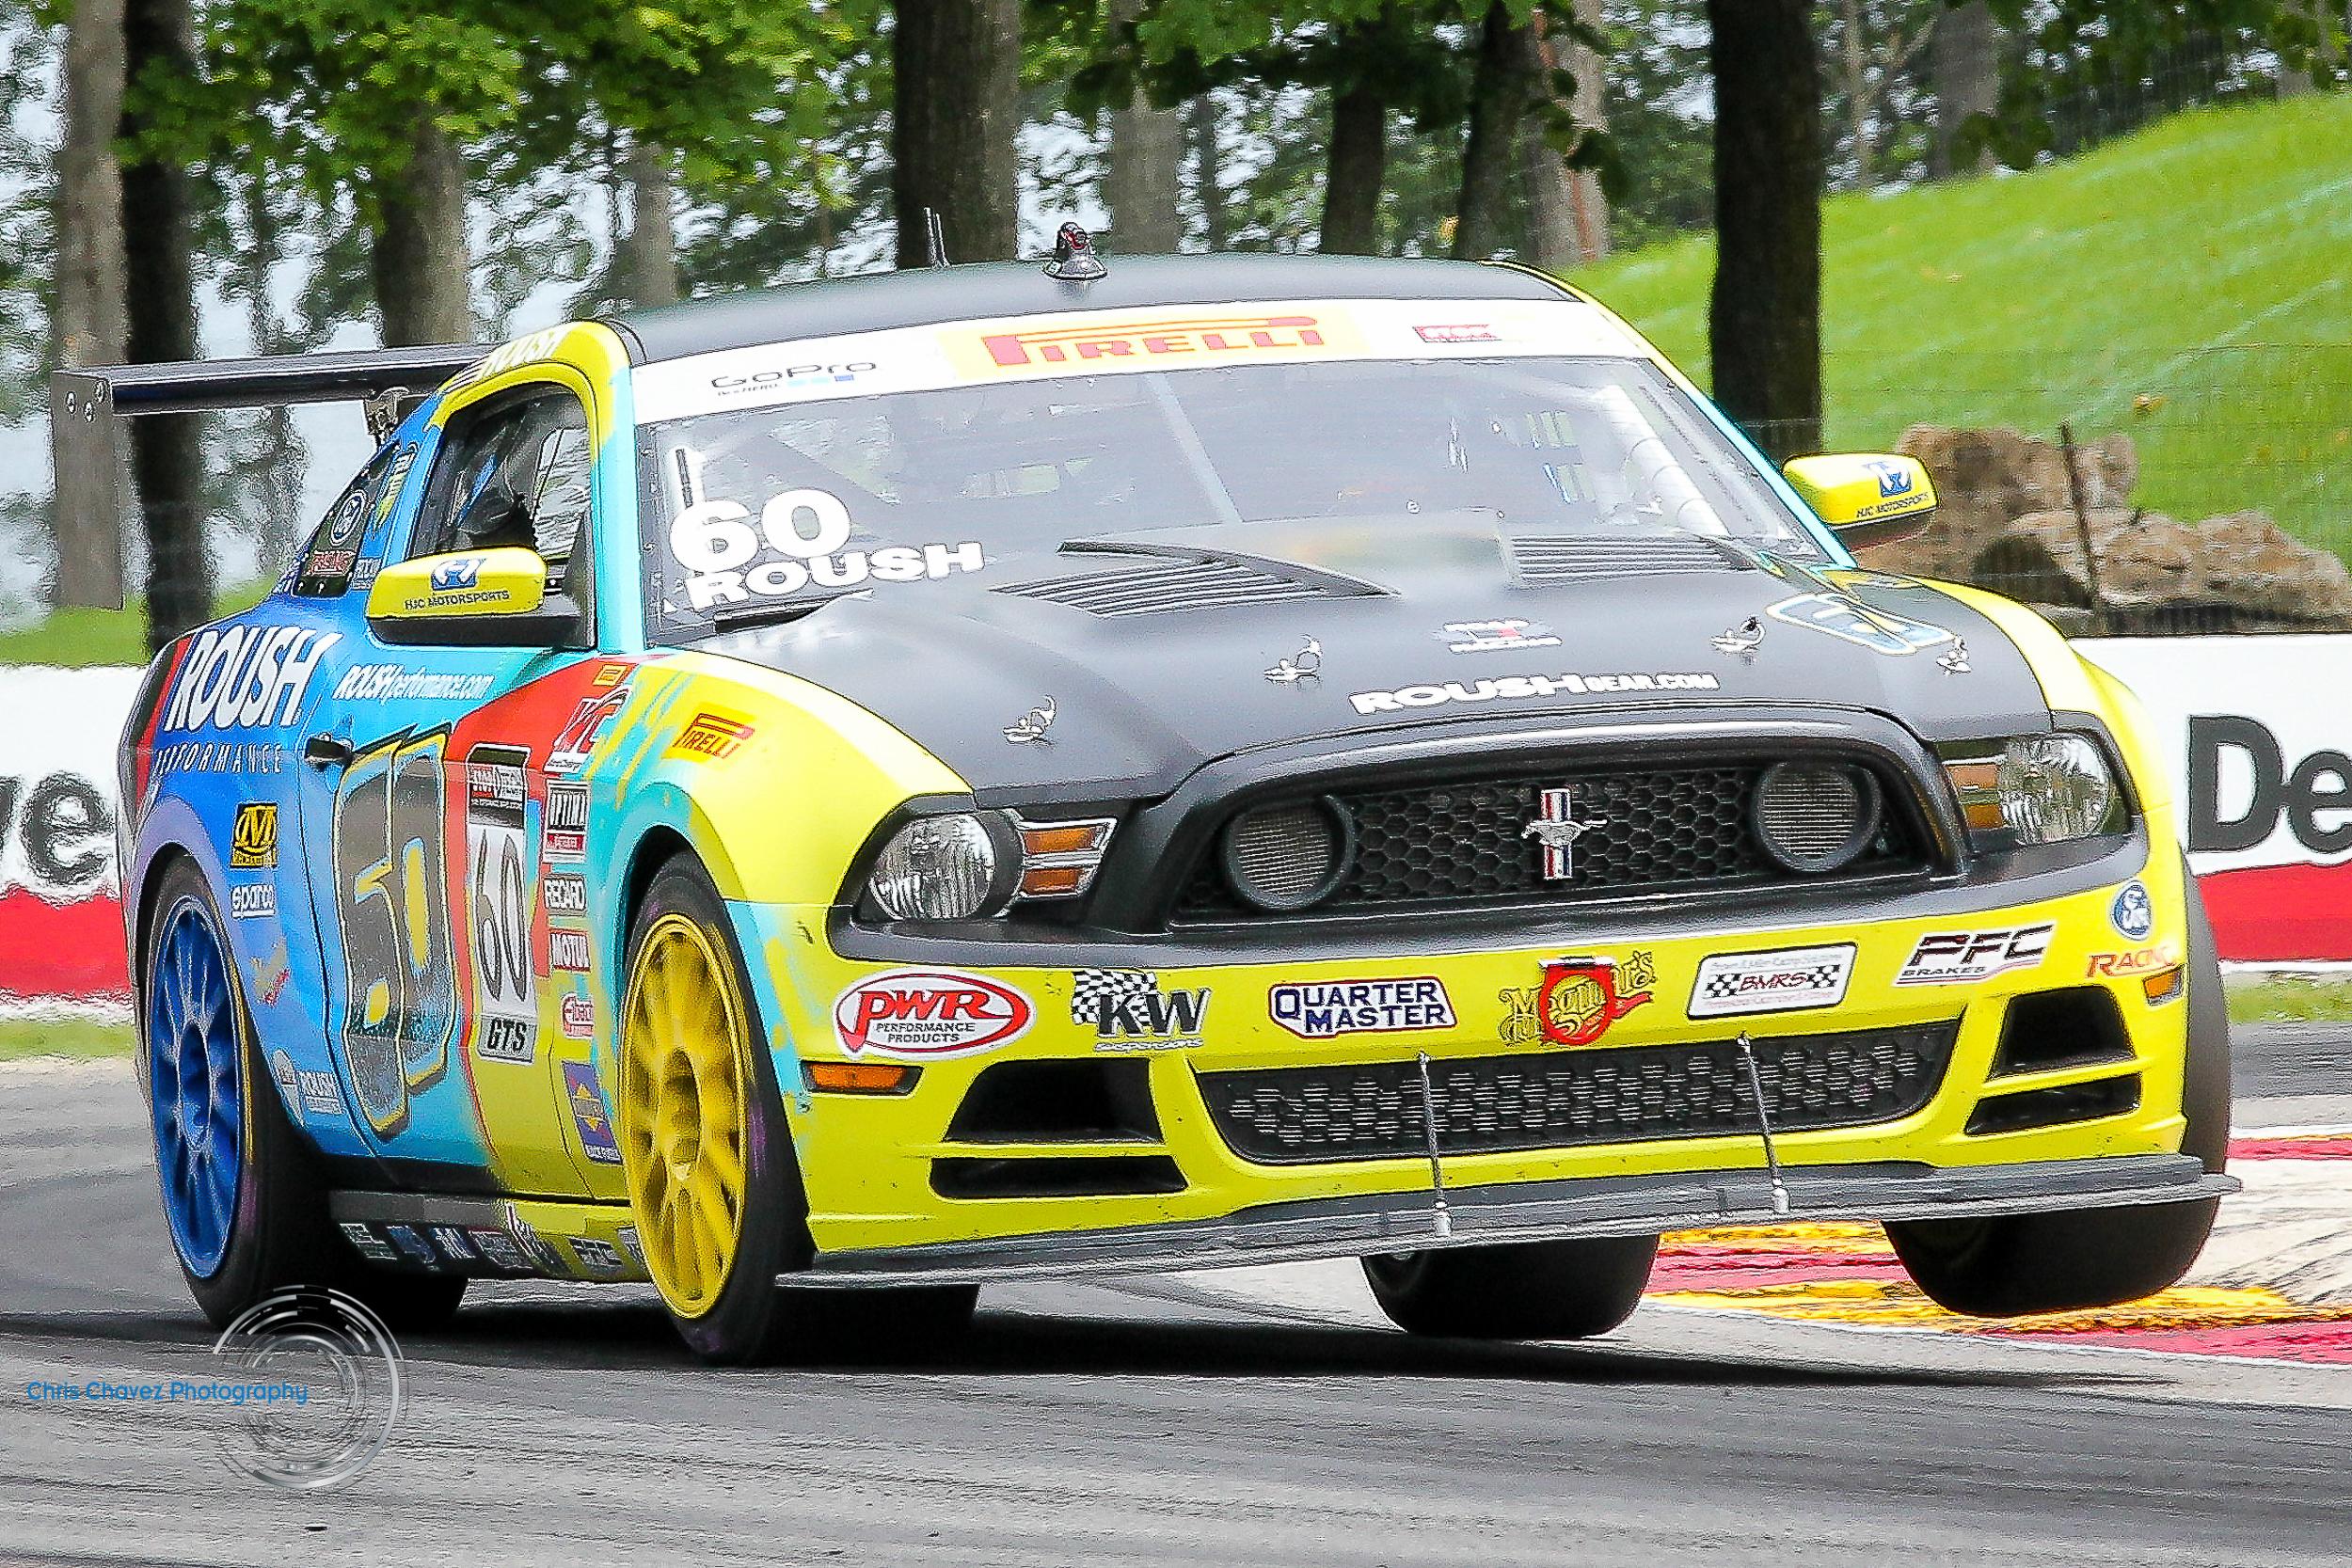 #60 Jack Roush Jr - Ford Mustang 302R - Roush Performance -